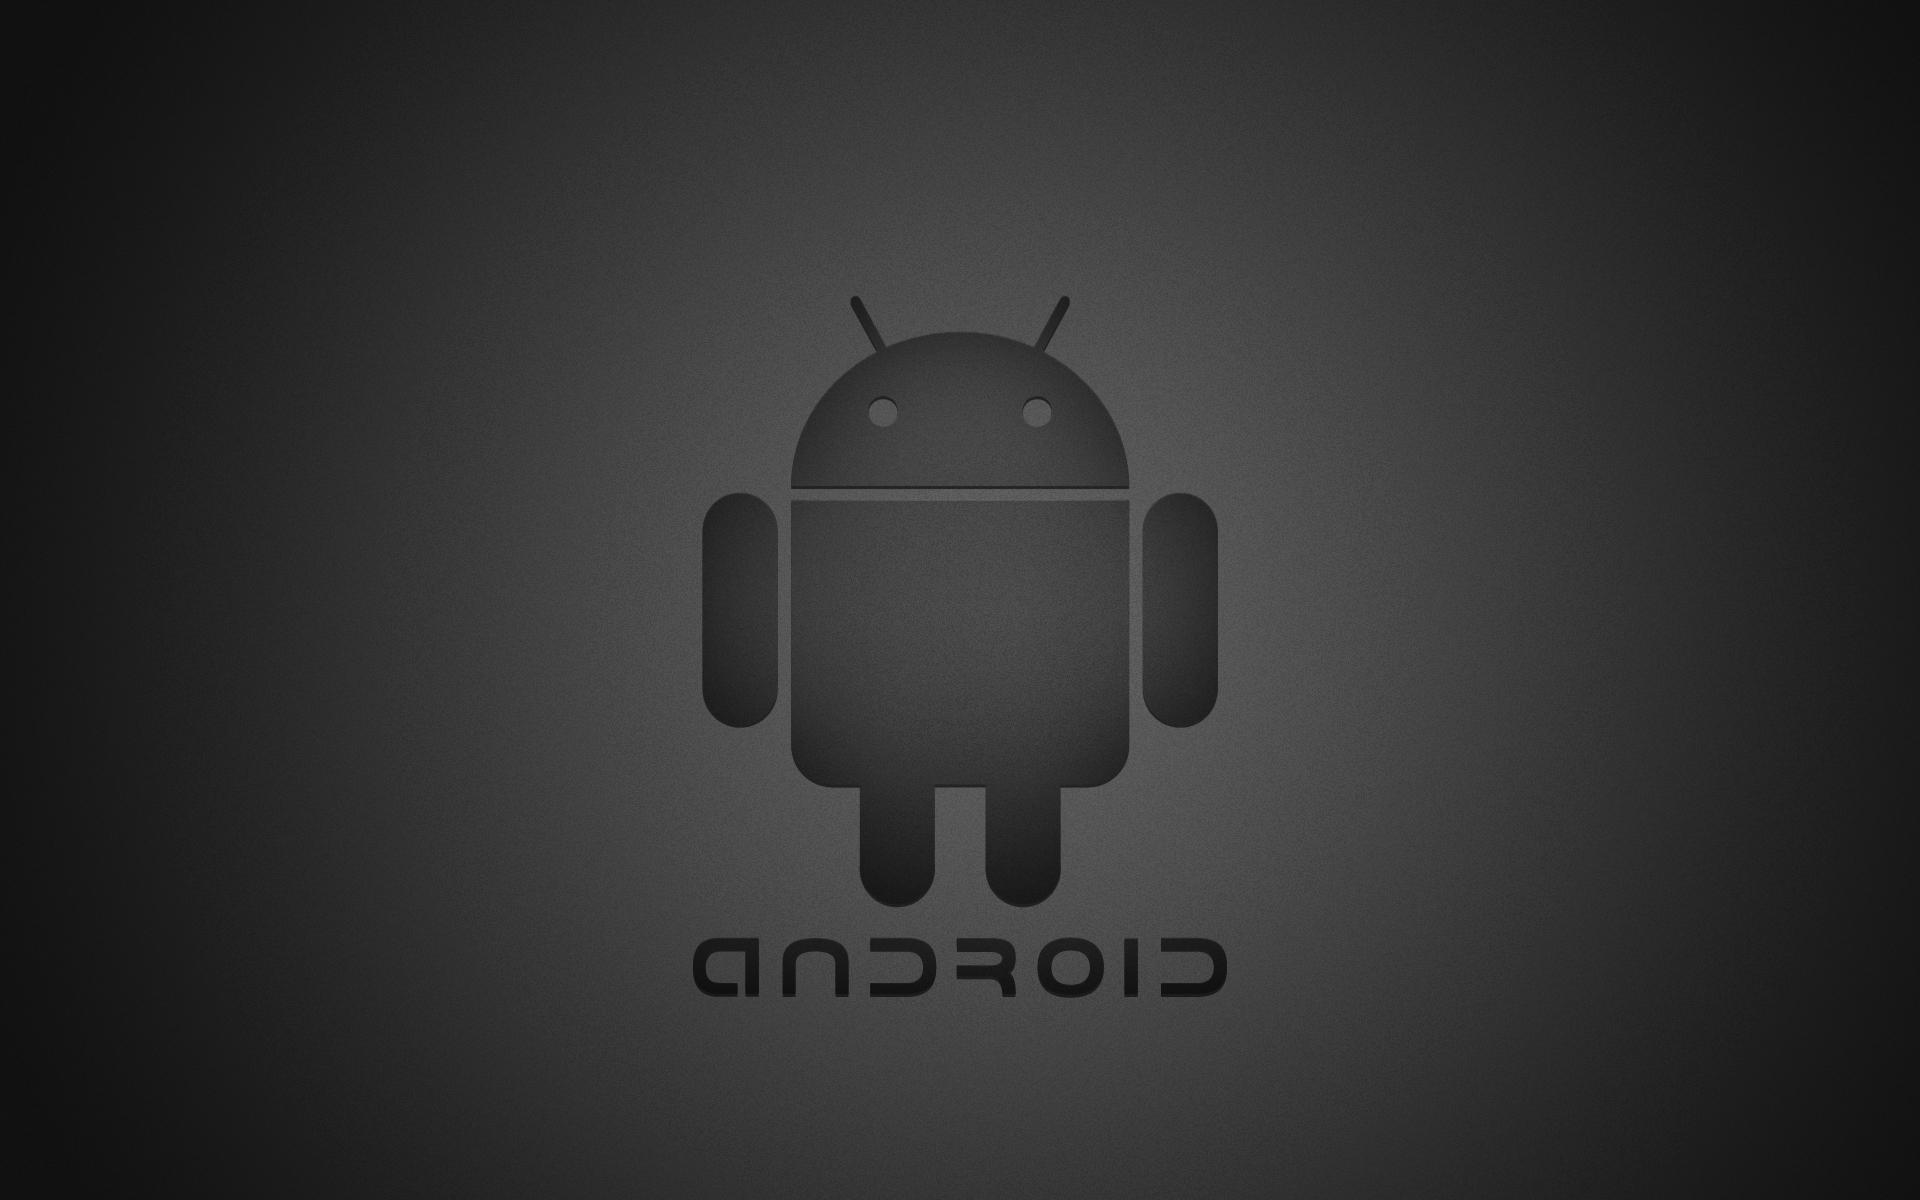 Dark Android Wallpaper 1920x1200 pixel Popular HD Wallpaper 26485 1920x1200